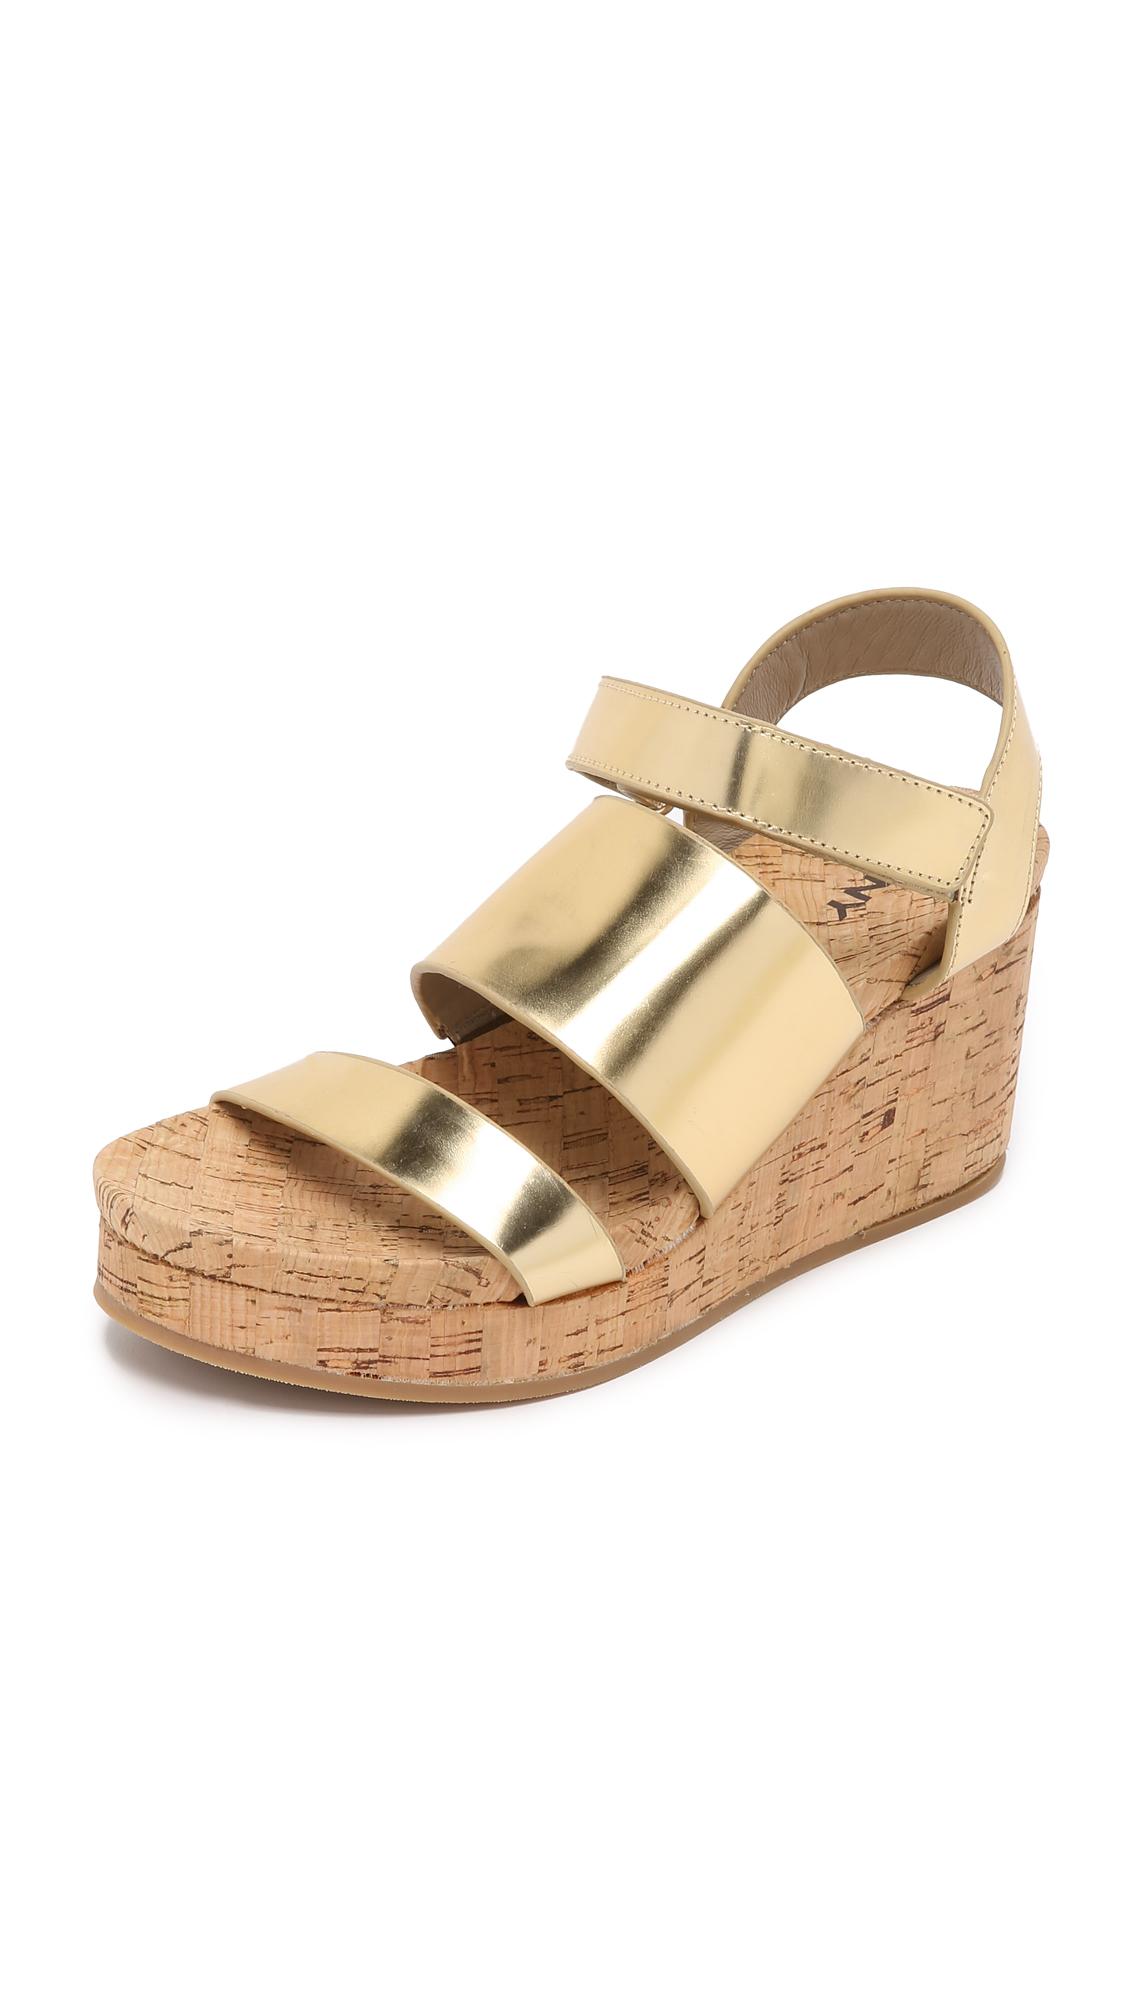 Dkny Lora Cork Wedge Sandals In Metallic Lyst